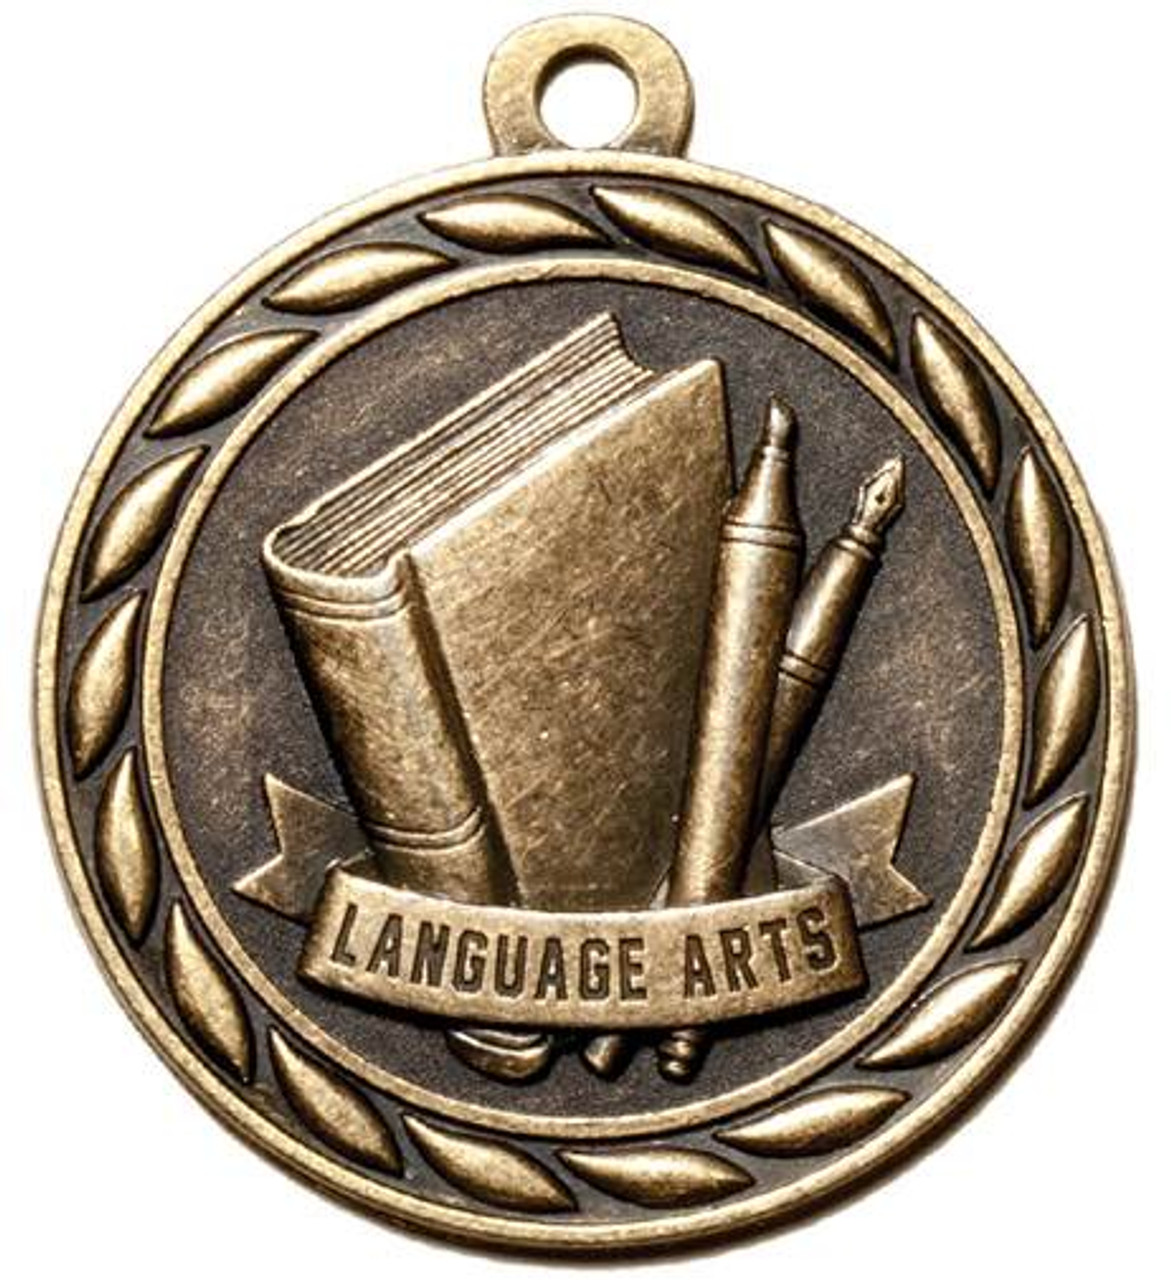 Lanuage Arts Medal